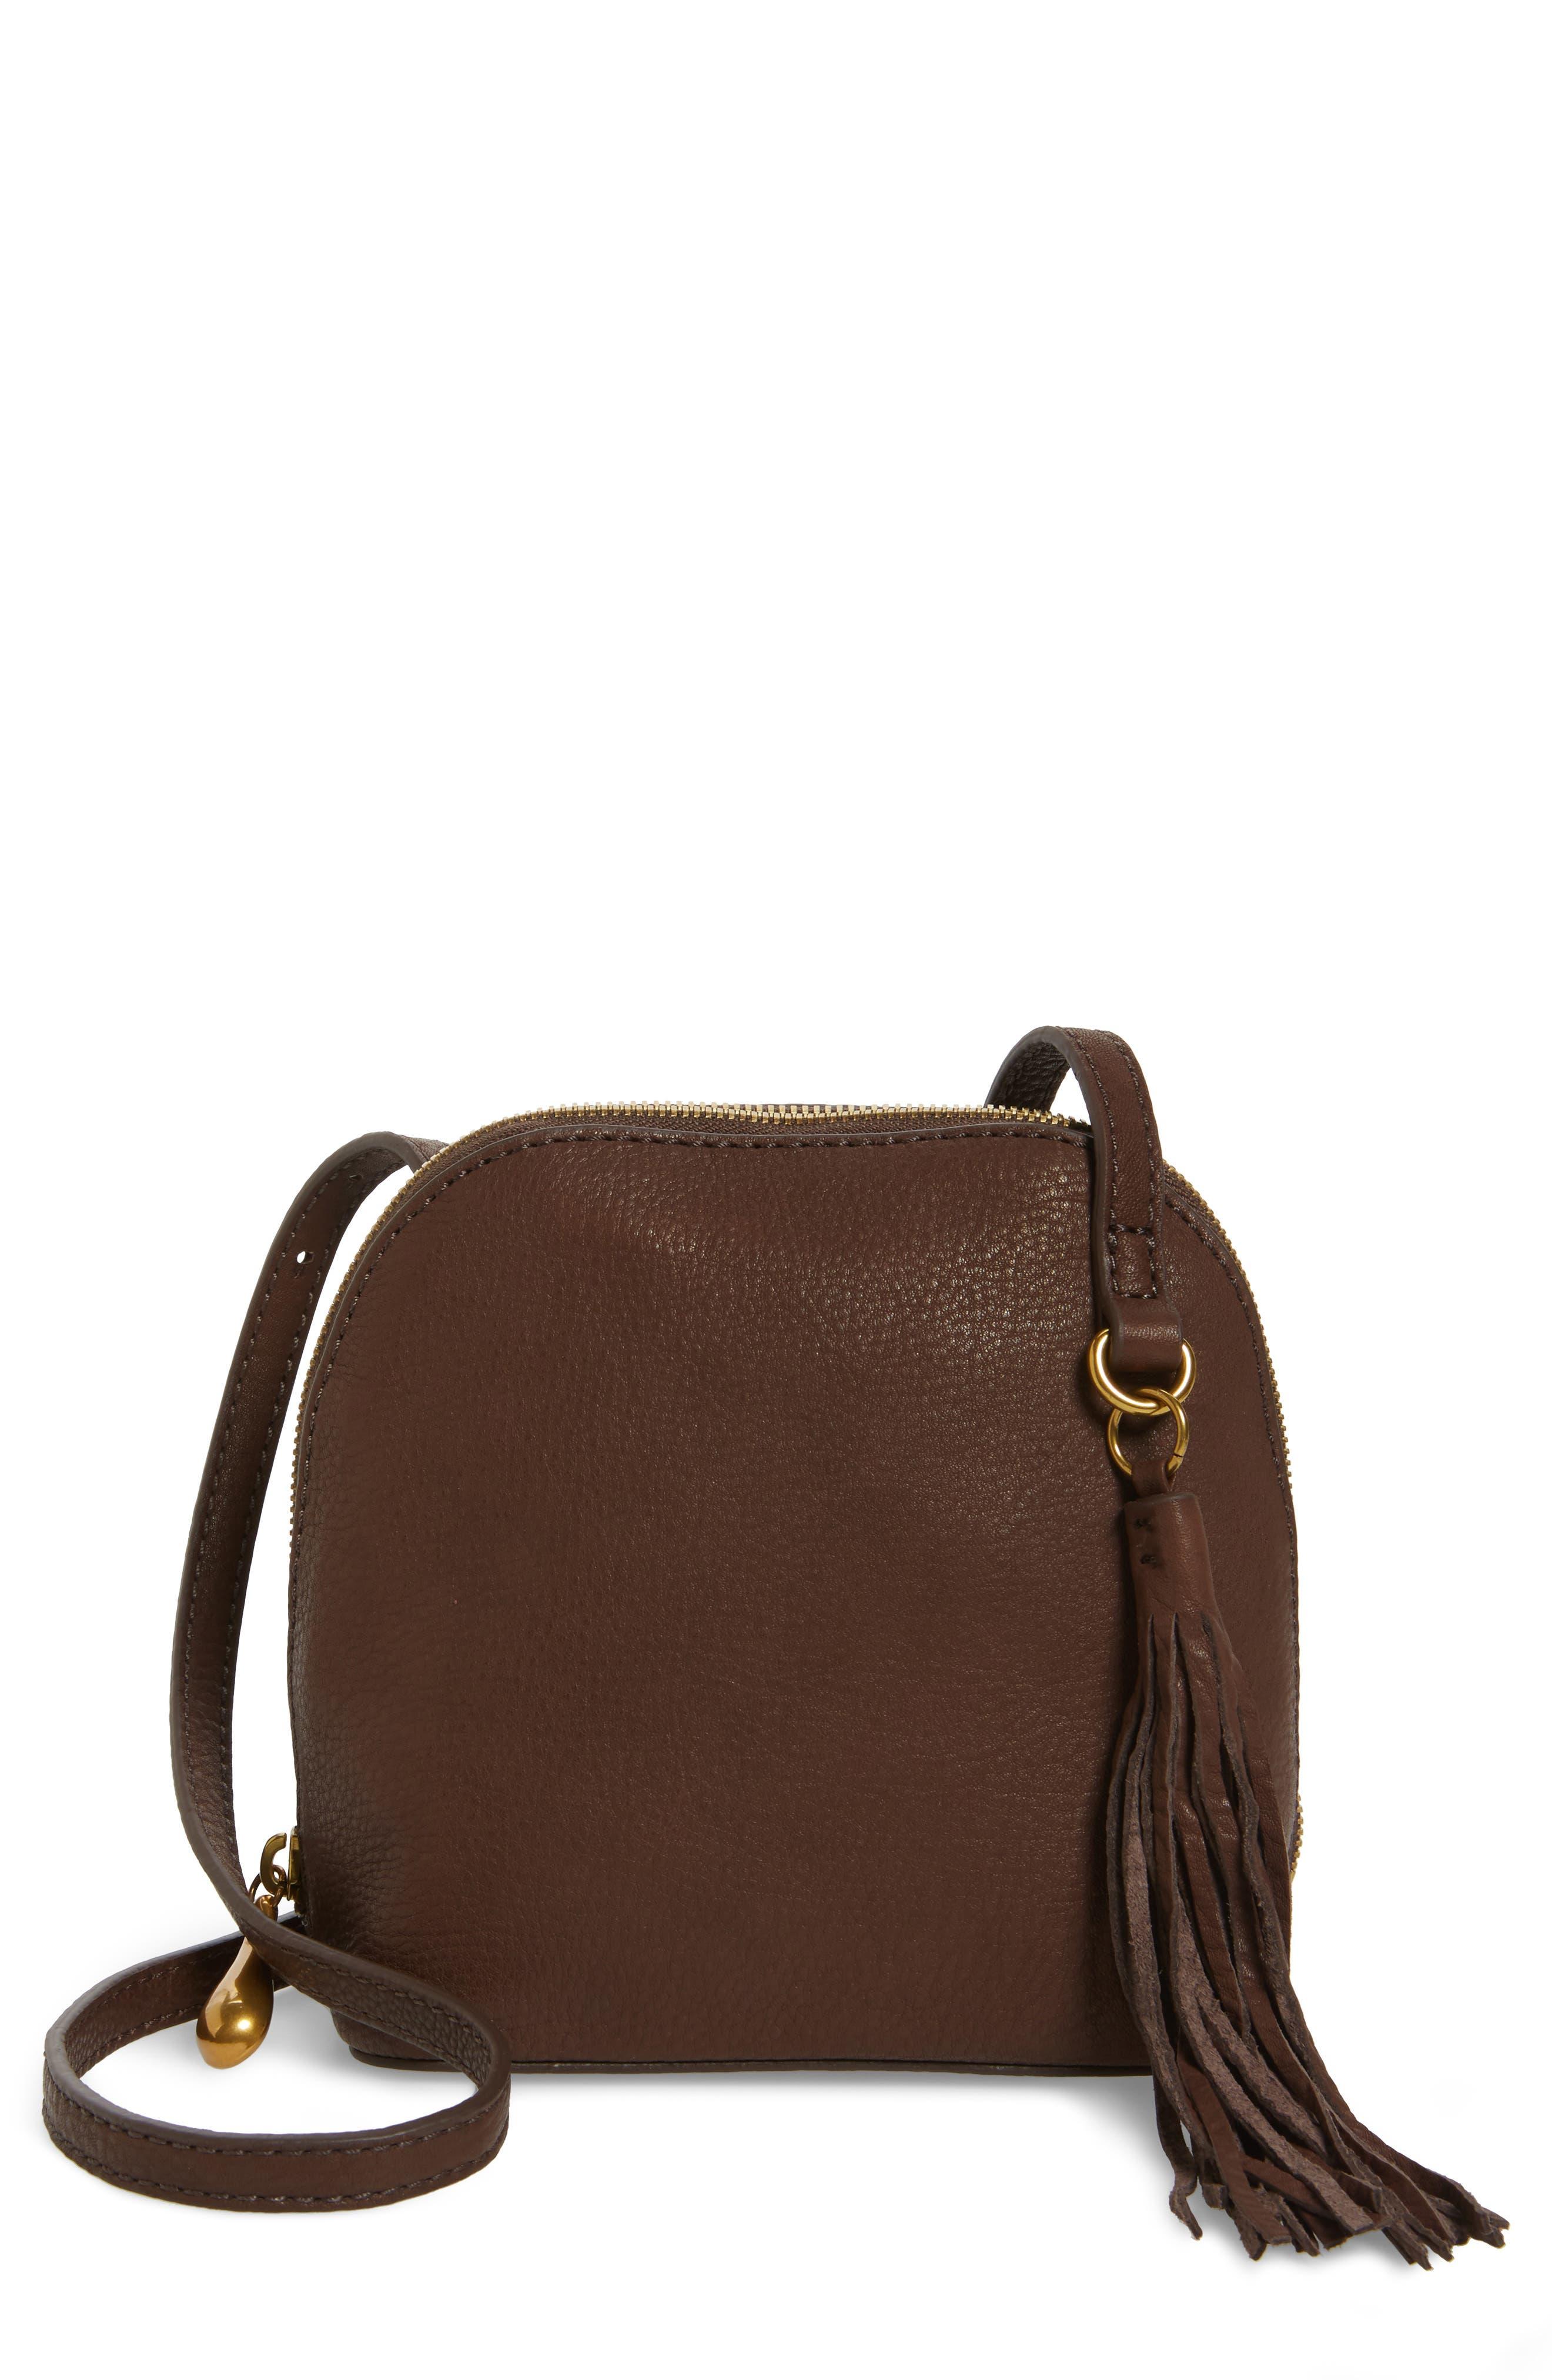 Alternate Image 1 Selected - Hobo Nash Calfskin Leather Crossbody Bag